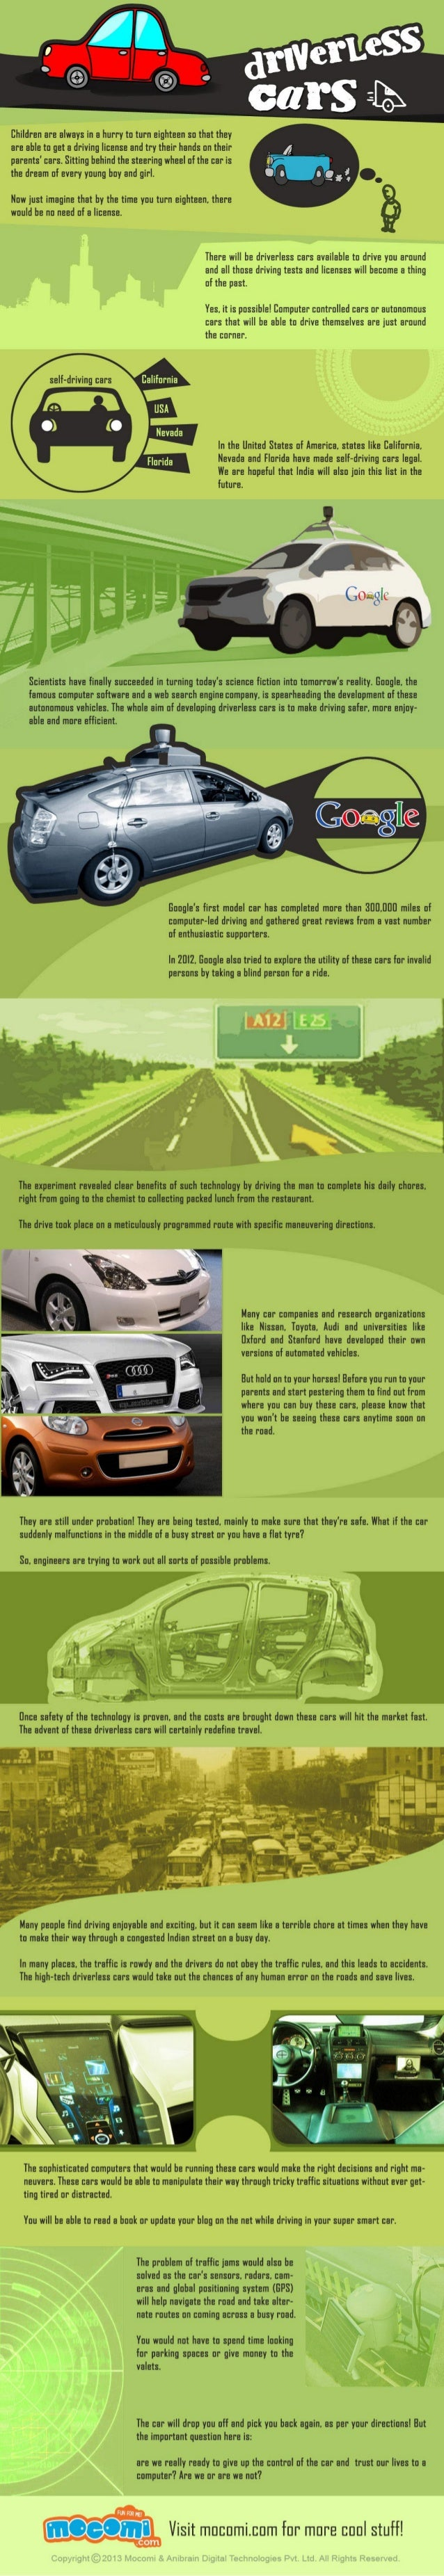 images moxigo google self driving car facts recherche